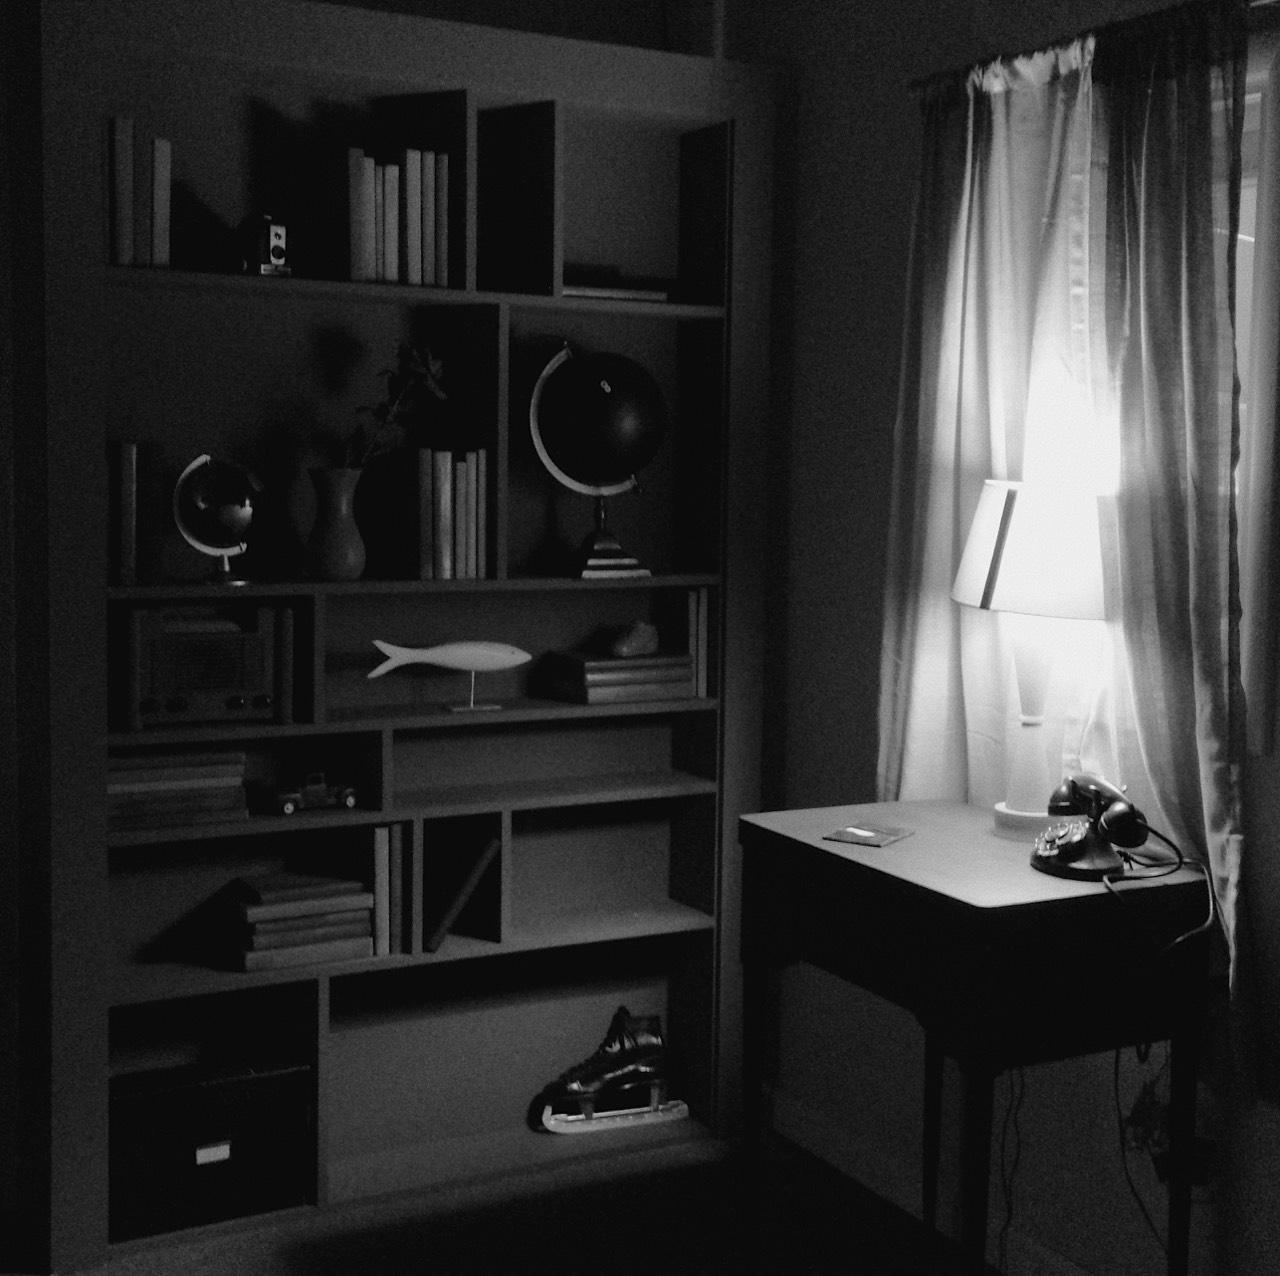 Pompton Lakes NJ Escape Room - Awaken - EscapeRoomNJ